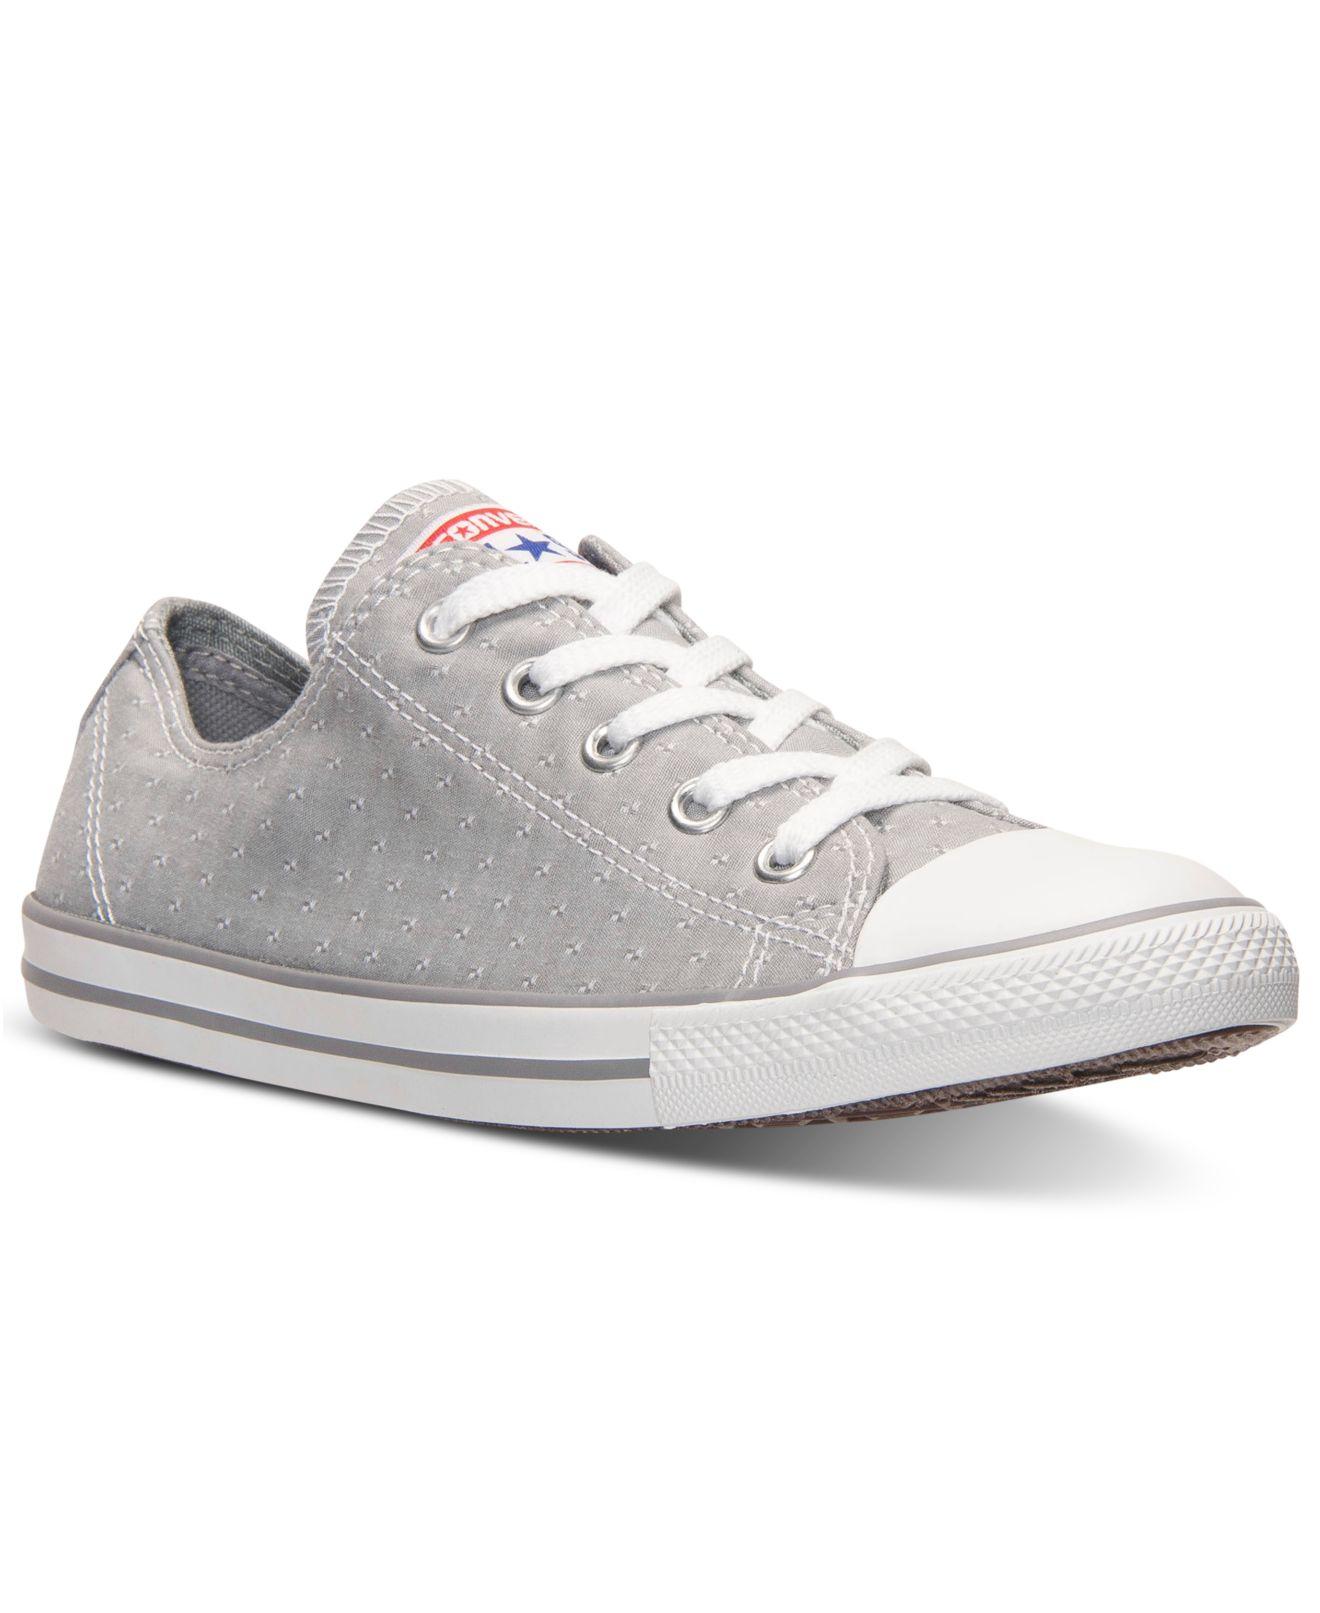 white converse womens size 7